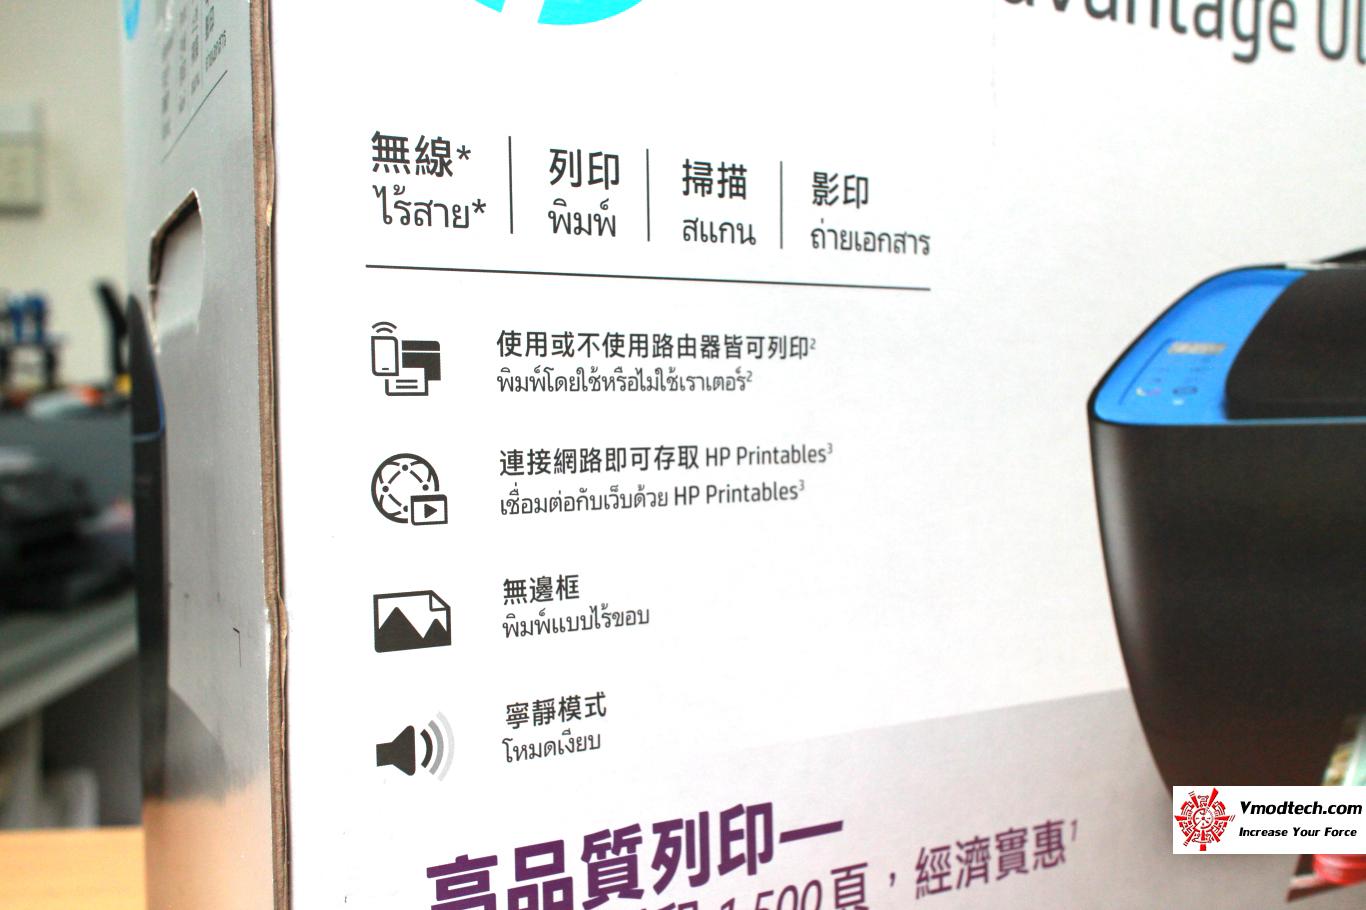 img 6956 HP Deskjet Ink Advantage Ultra 4729 All in One Printer